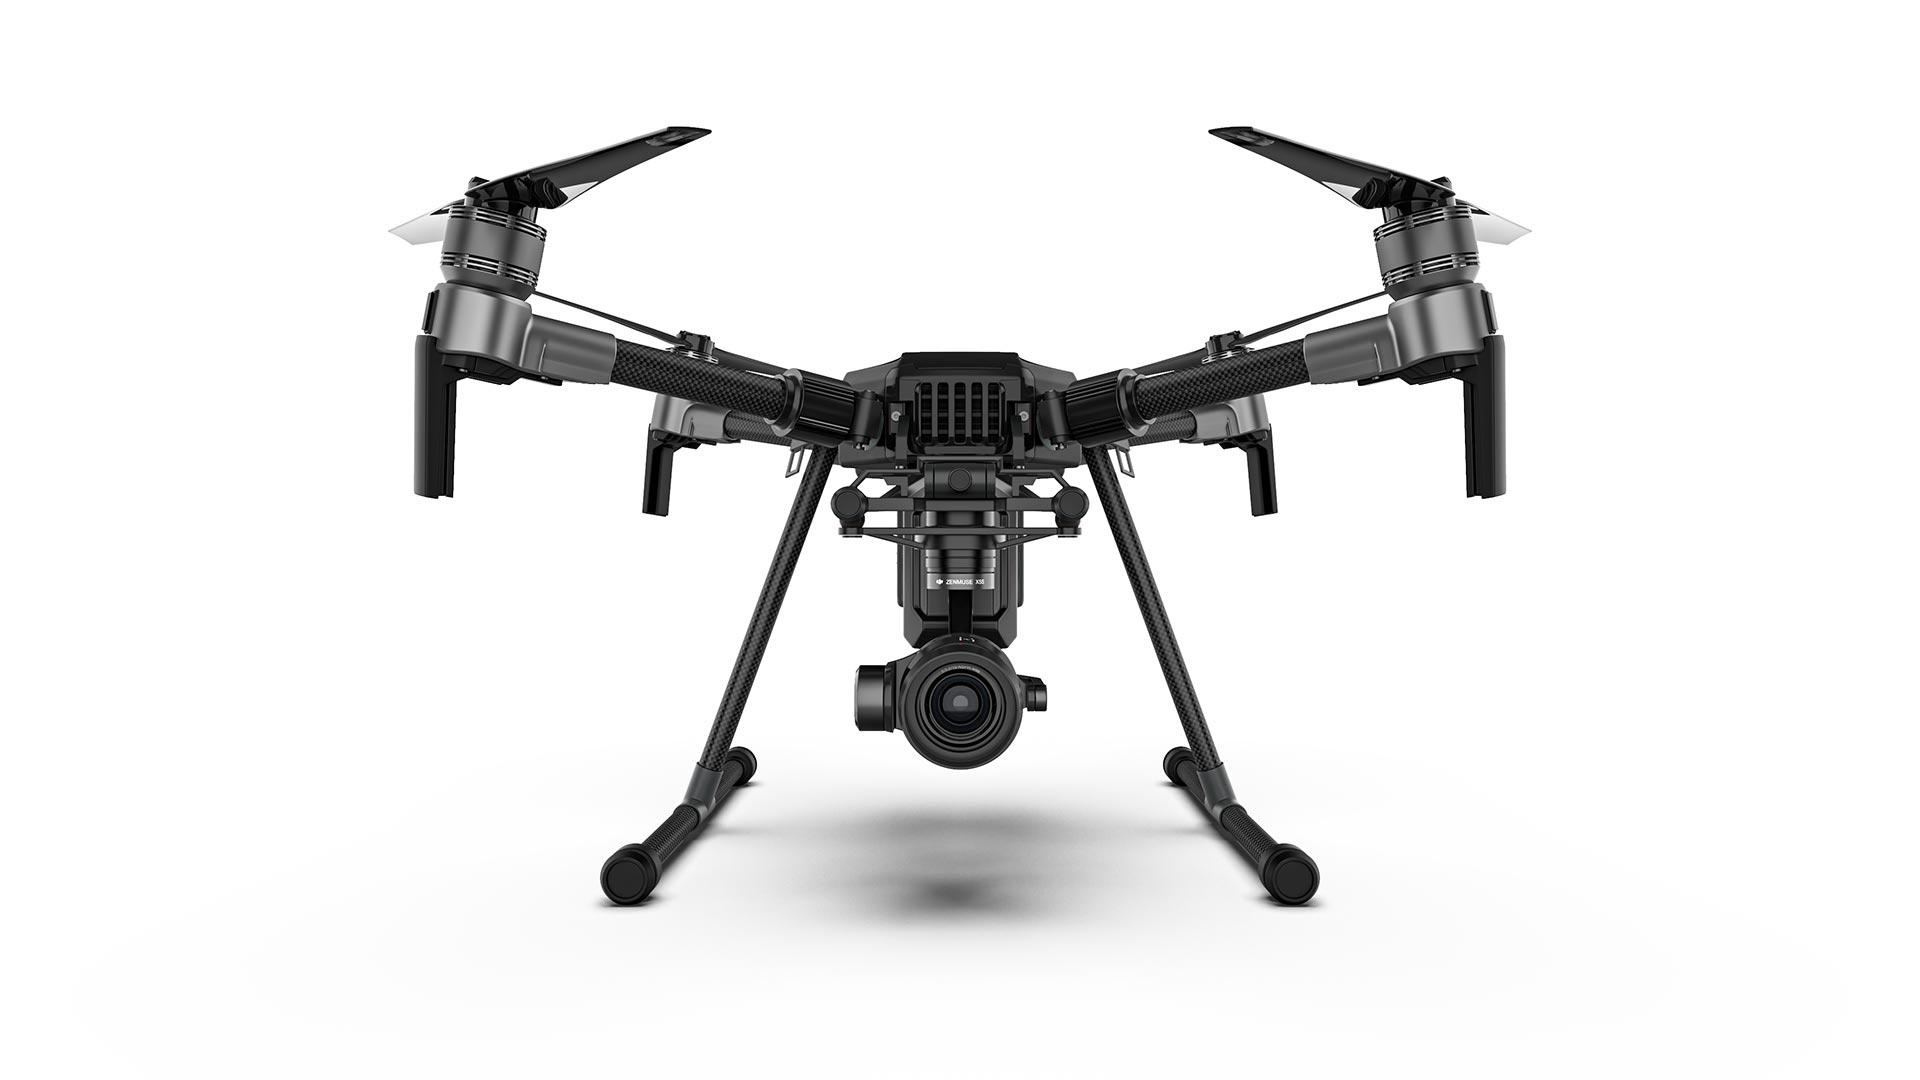 Drone 3D Rendering